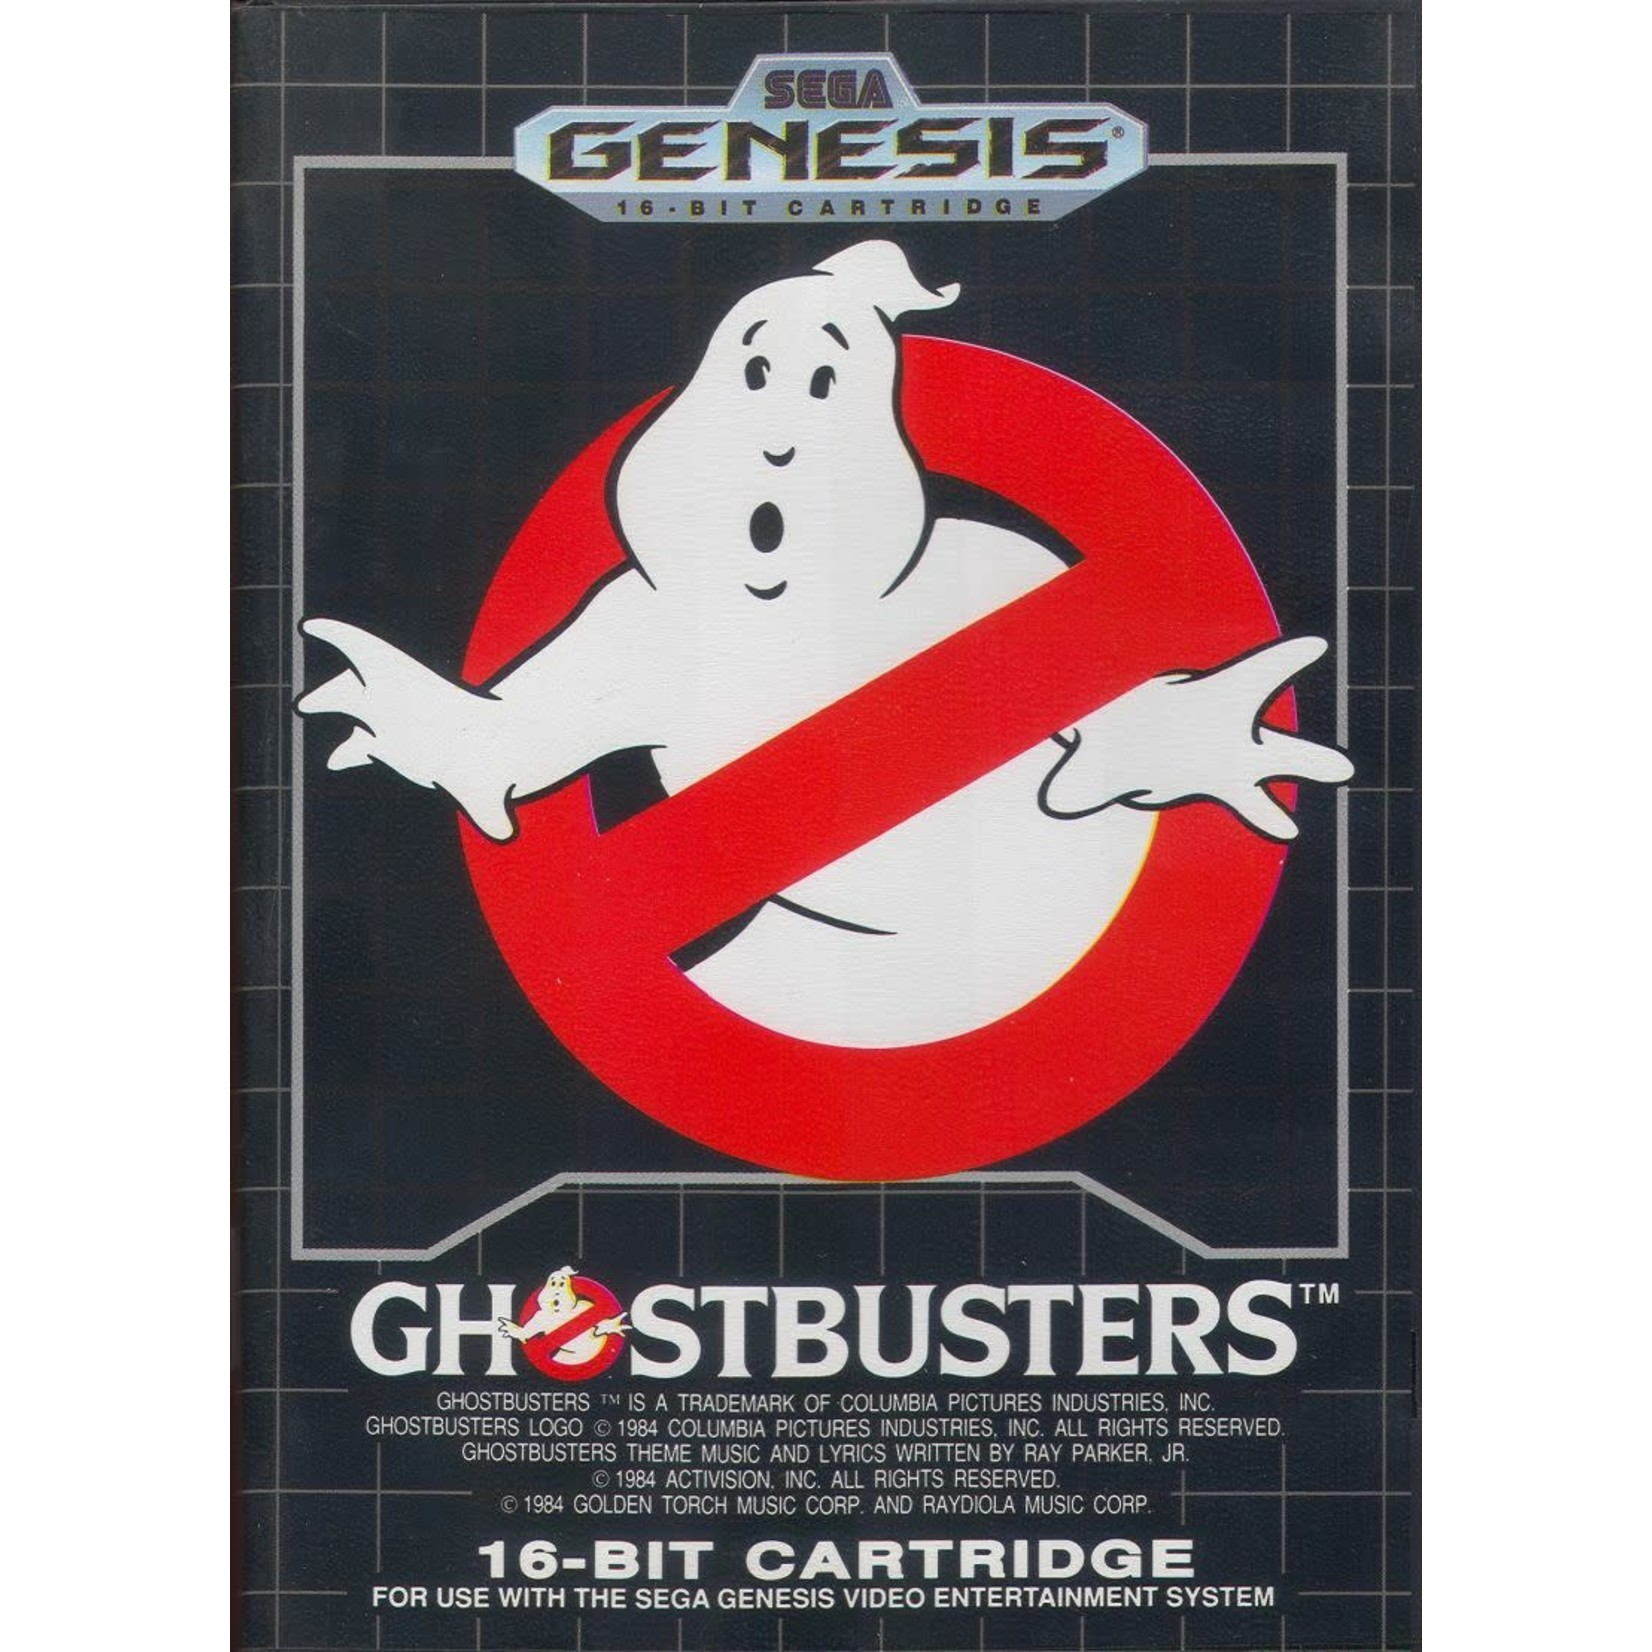 sgu-ghostbusters (inbox) no manuel